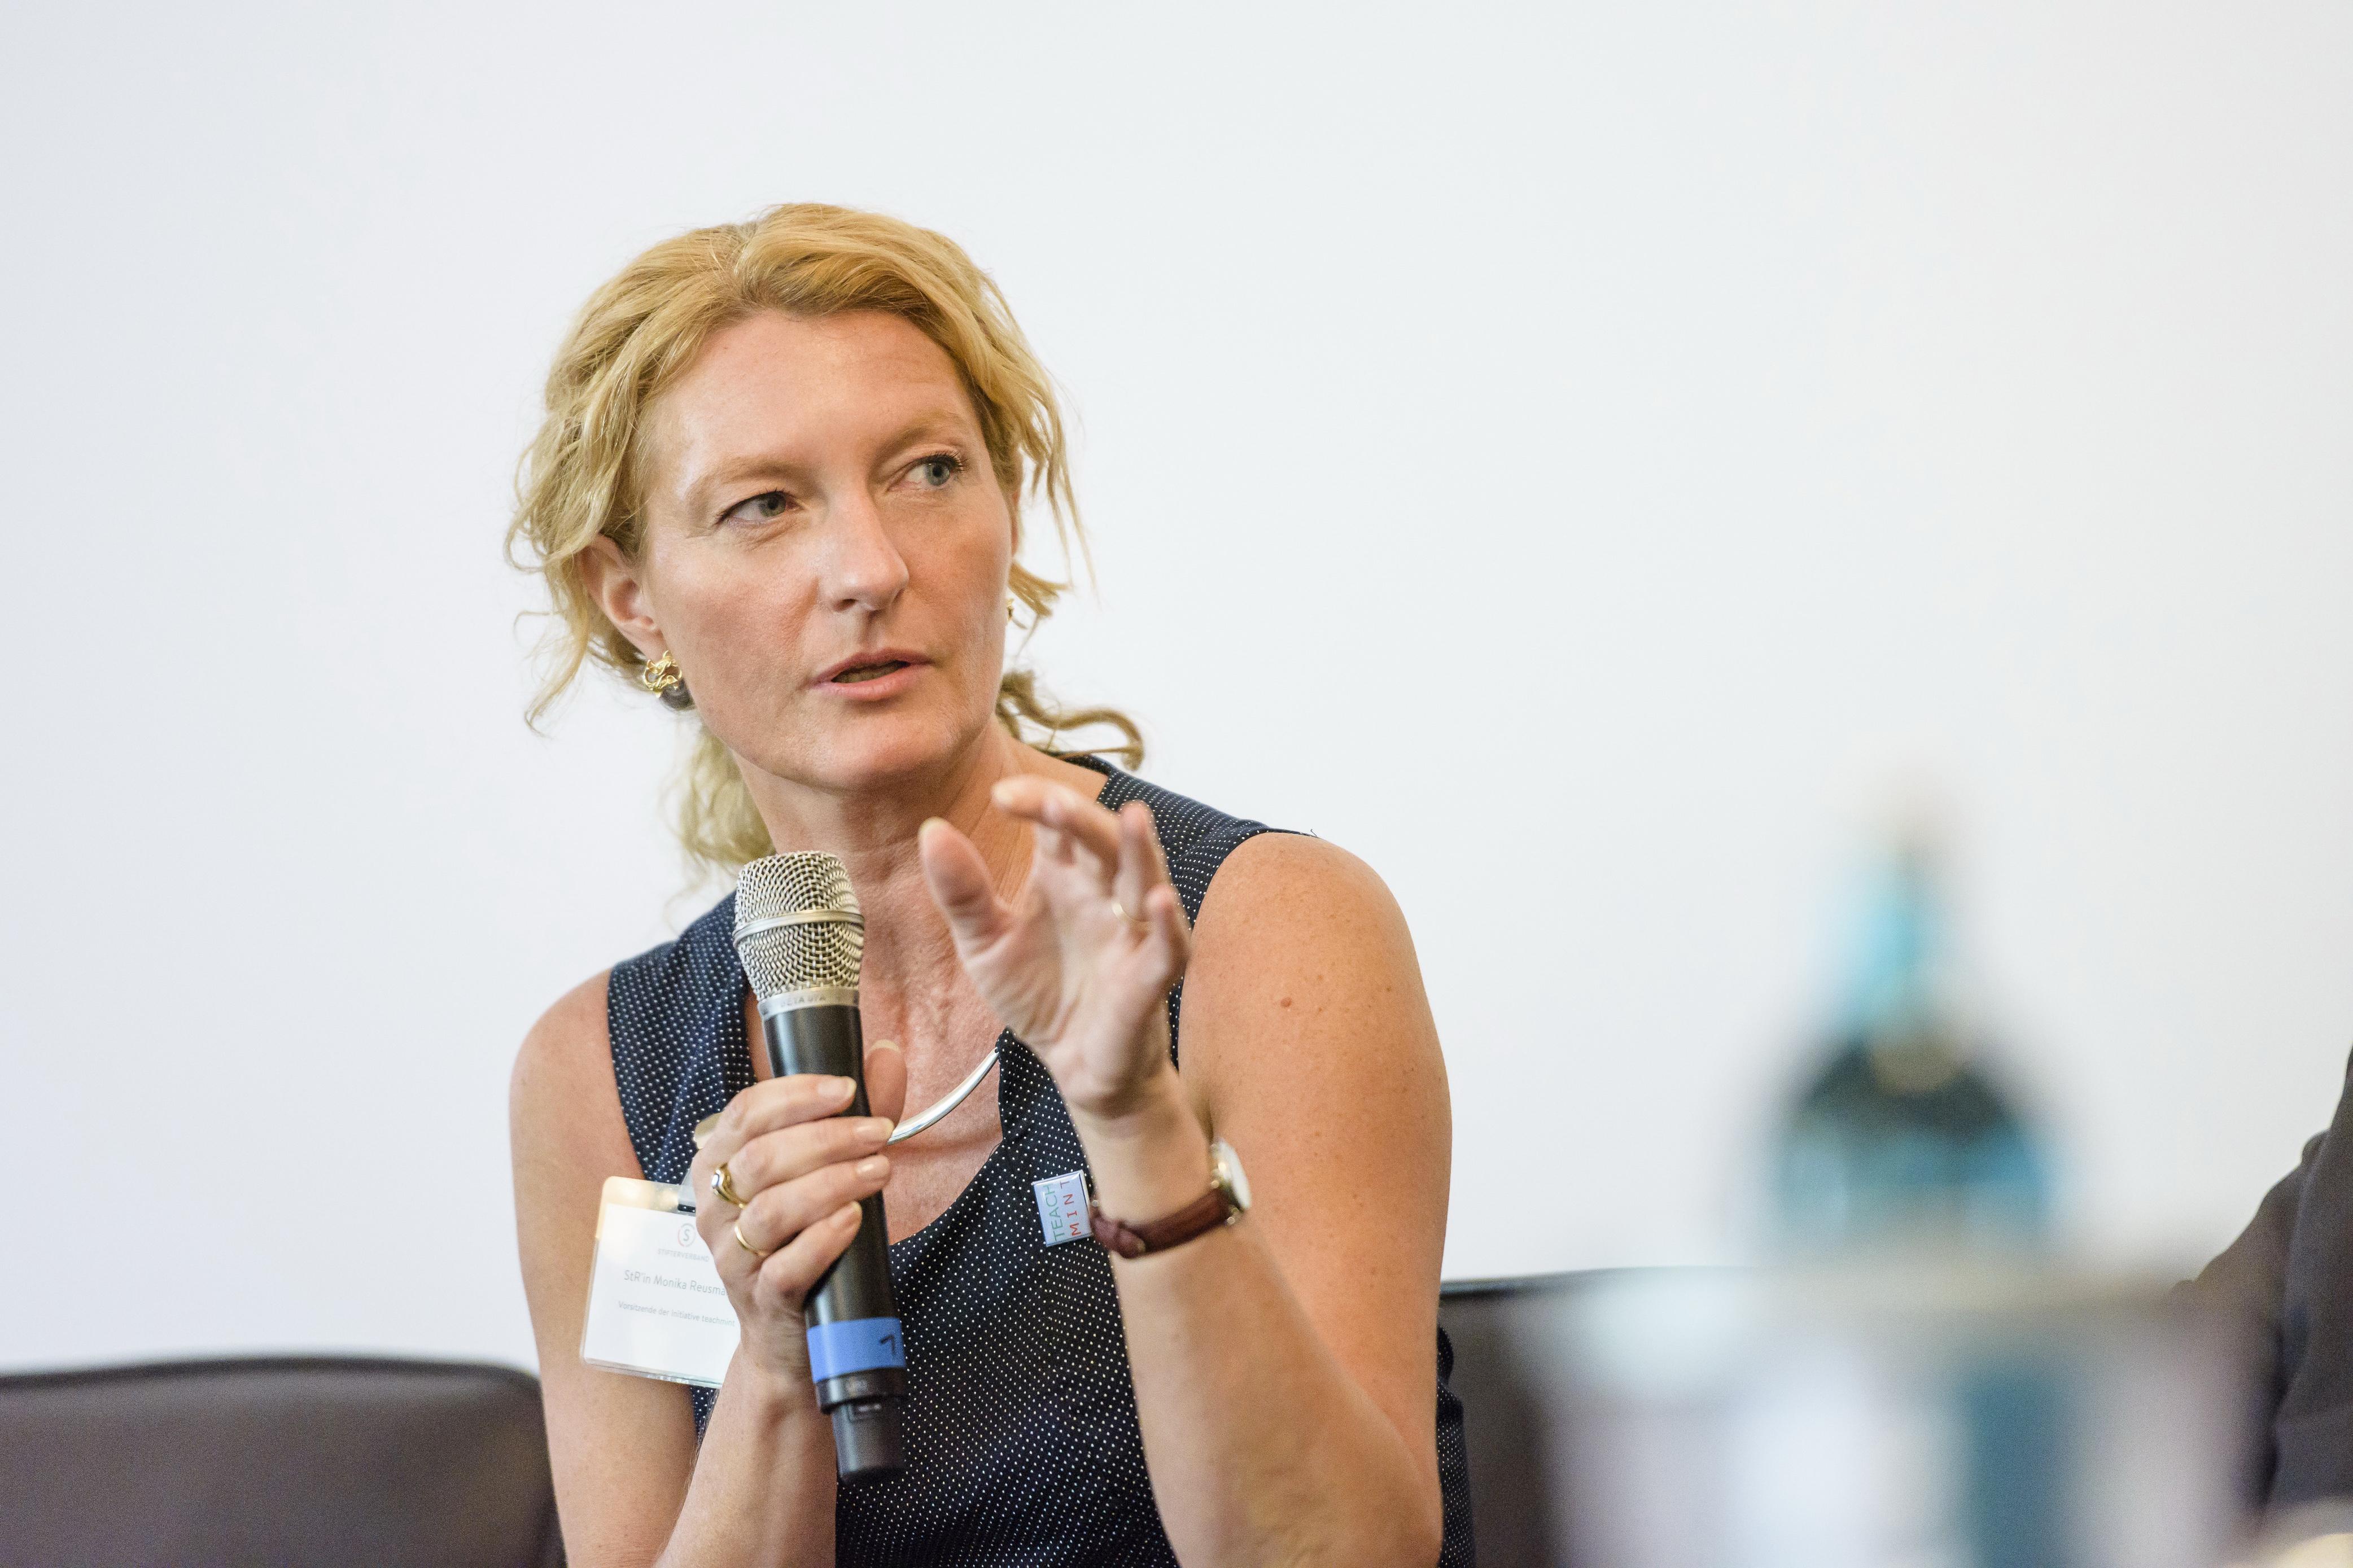 Podiumsdiskussion, M. Reusmann, Foto: Damian Gorczany/Stifterverband